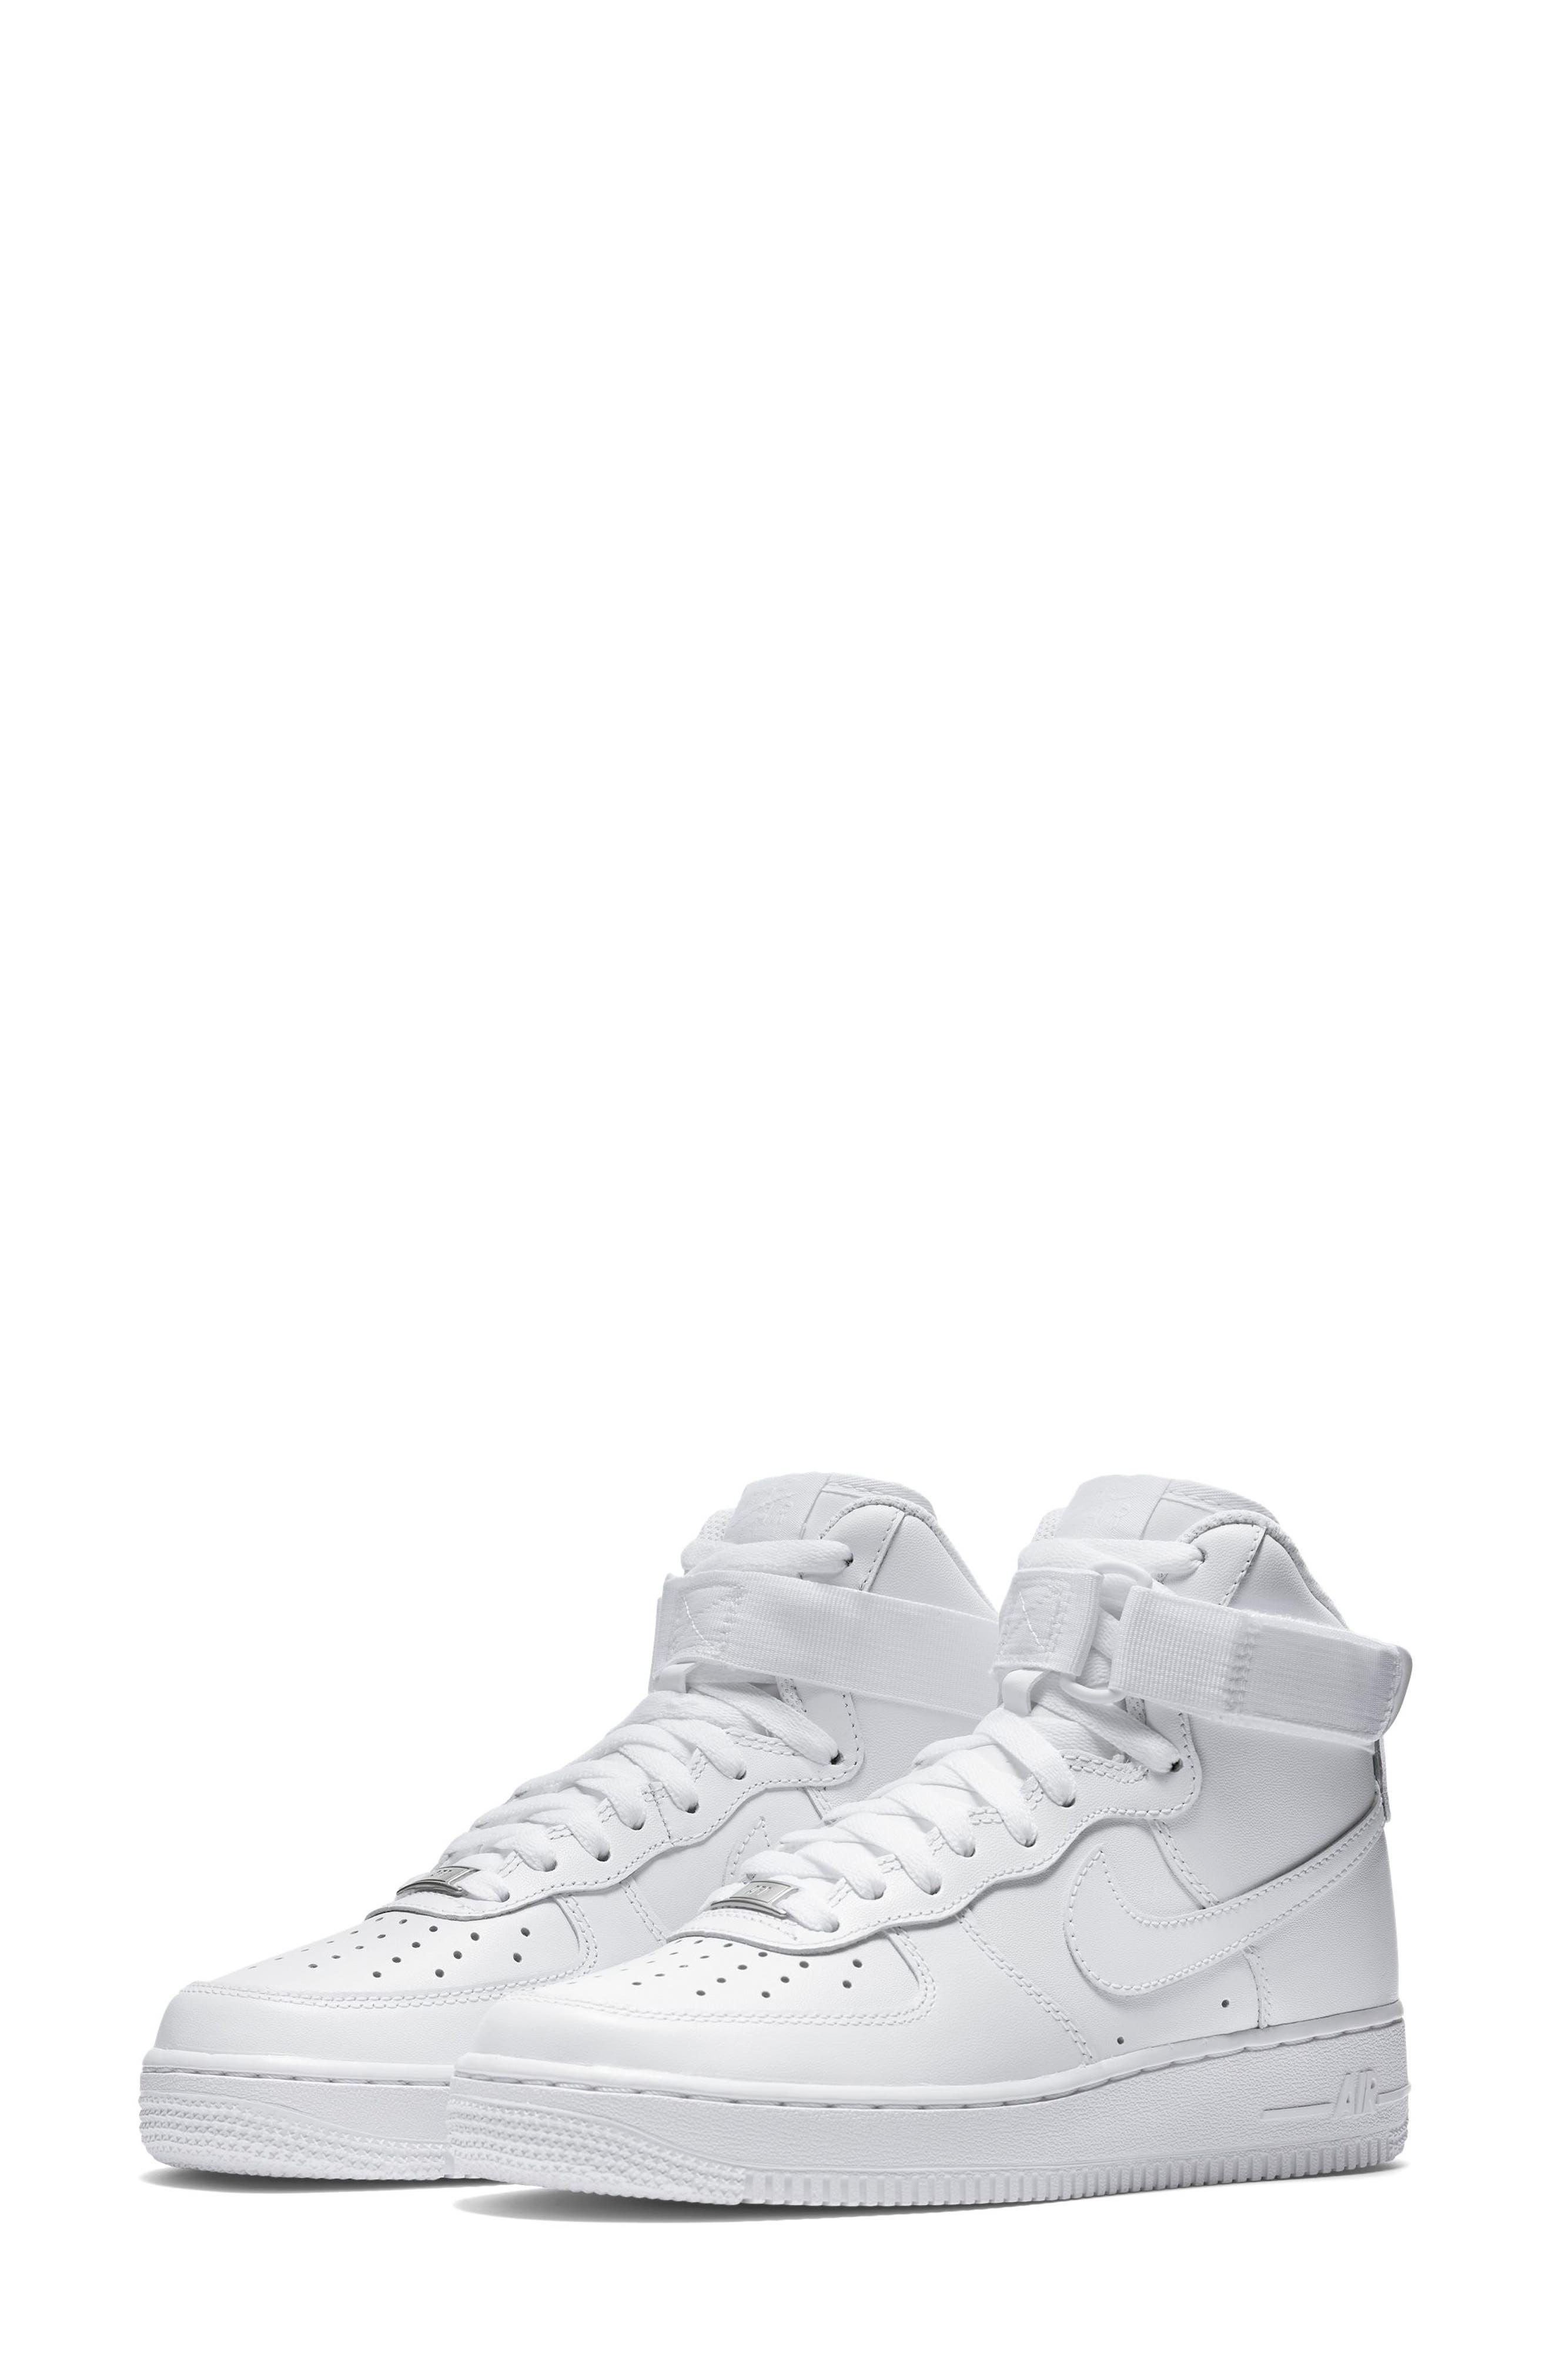 NIKE Air Force 1 High Top Sneaker, Main, color, WHITE/ WHITE/ WHITE